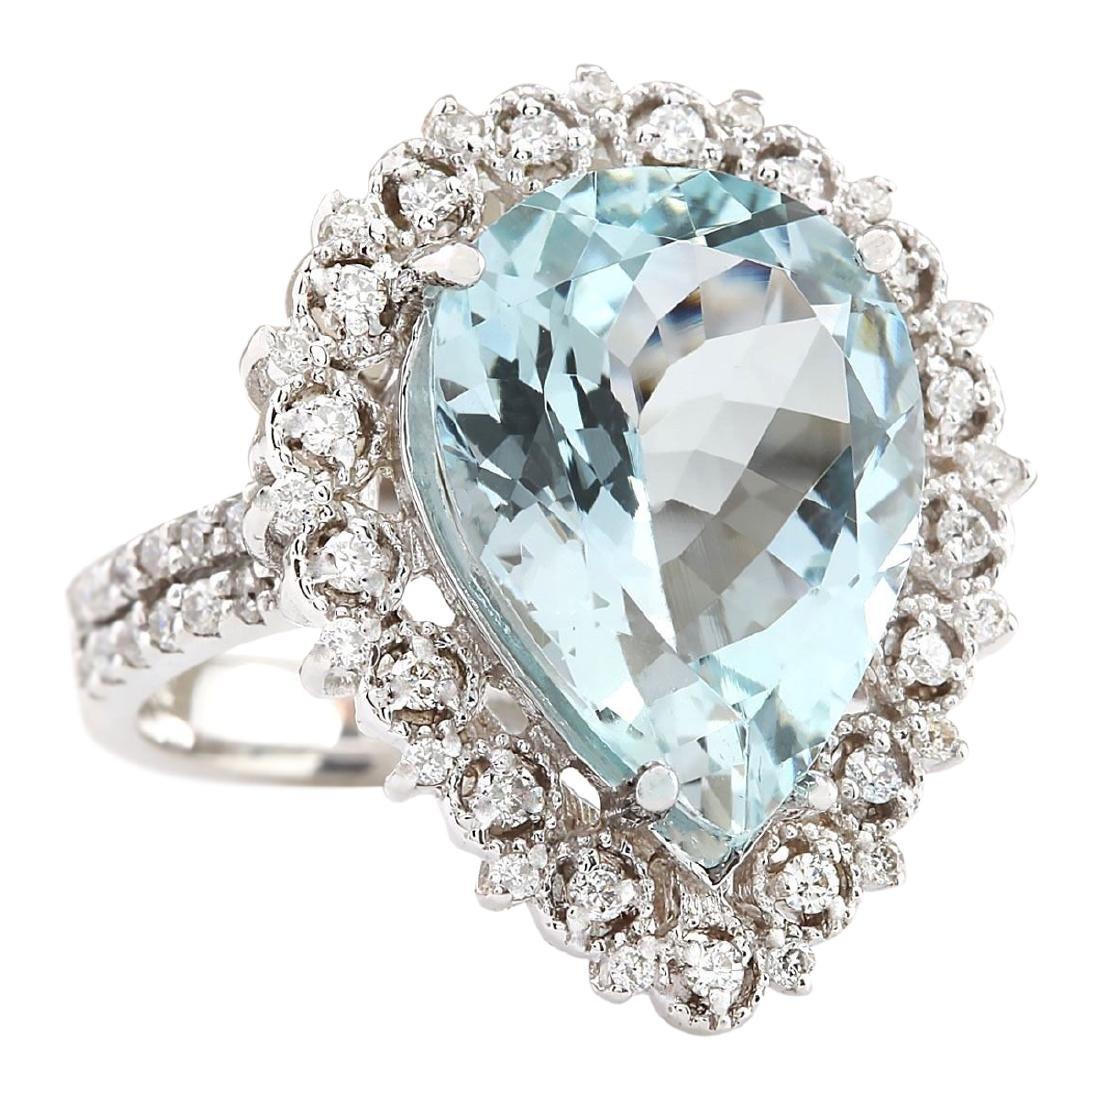 7.96 CTW Natural Aquamarine And Diamond Ring In 18K - 2